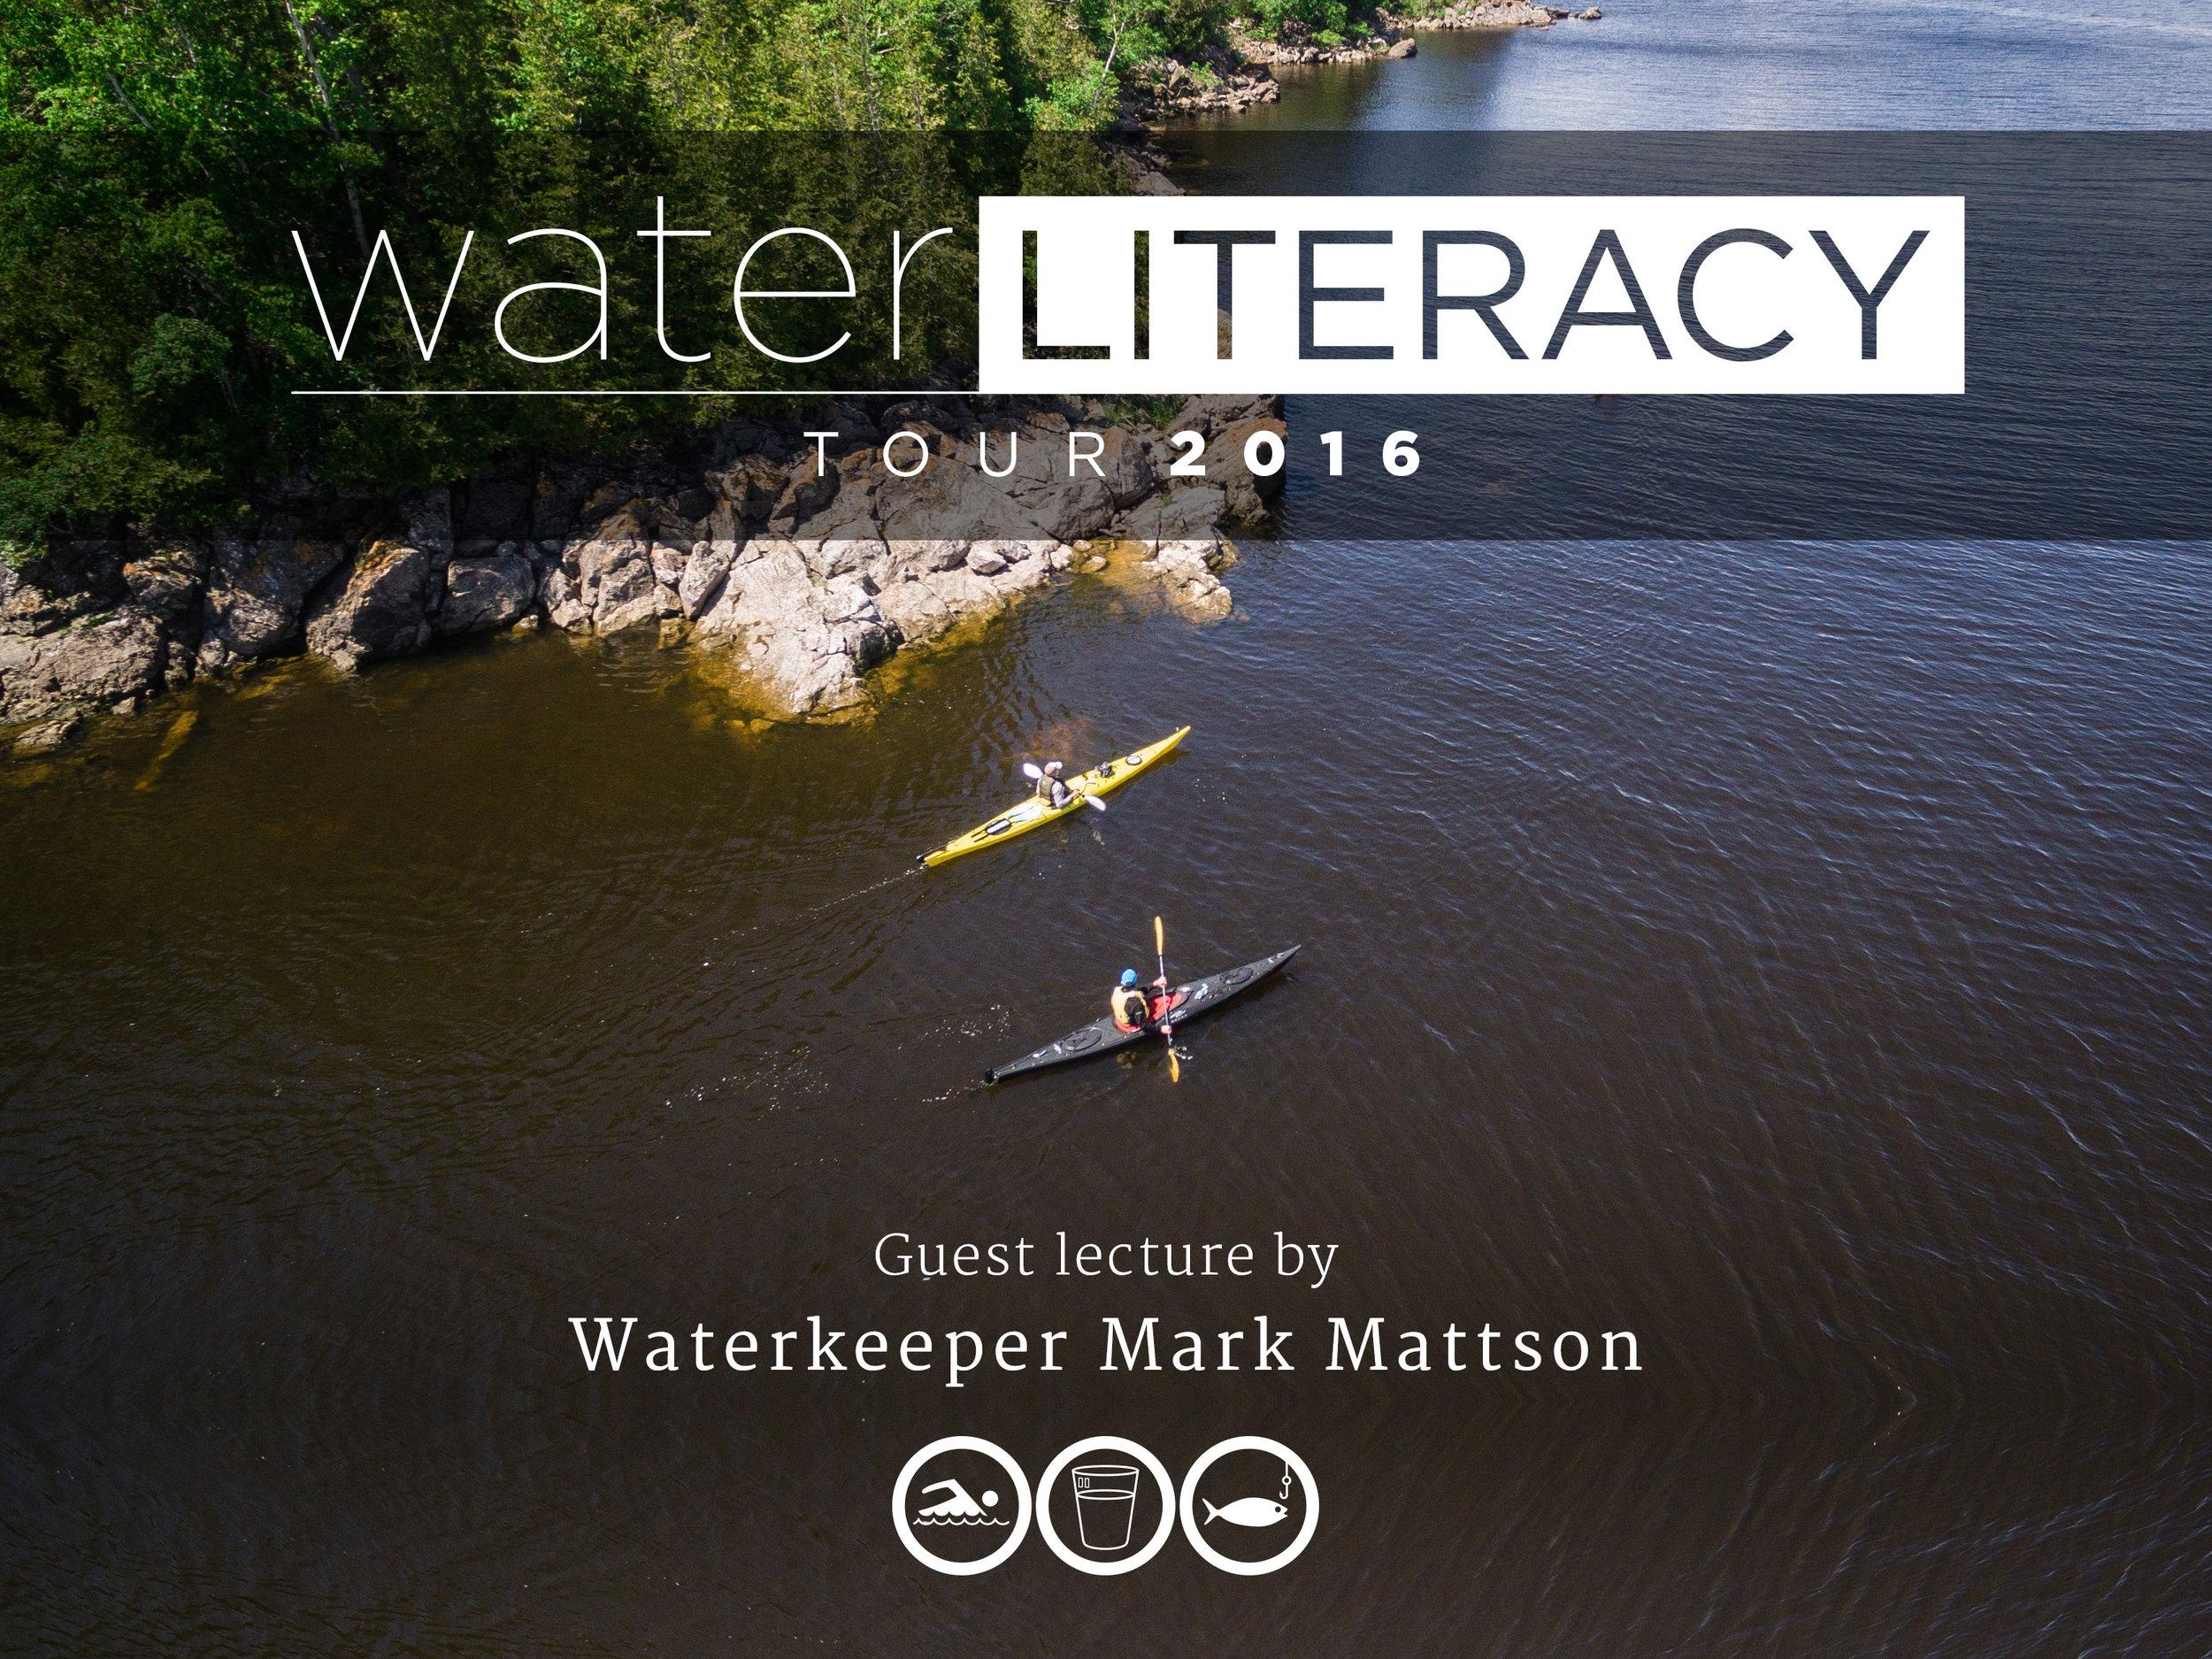 Waterkeeper Mark Mattson and Joseph Boyden paddling along the Kennebecasis River. (Photo by Dylan Neild)